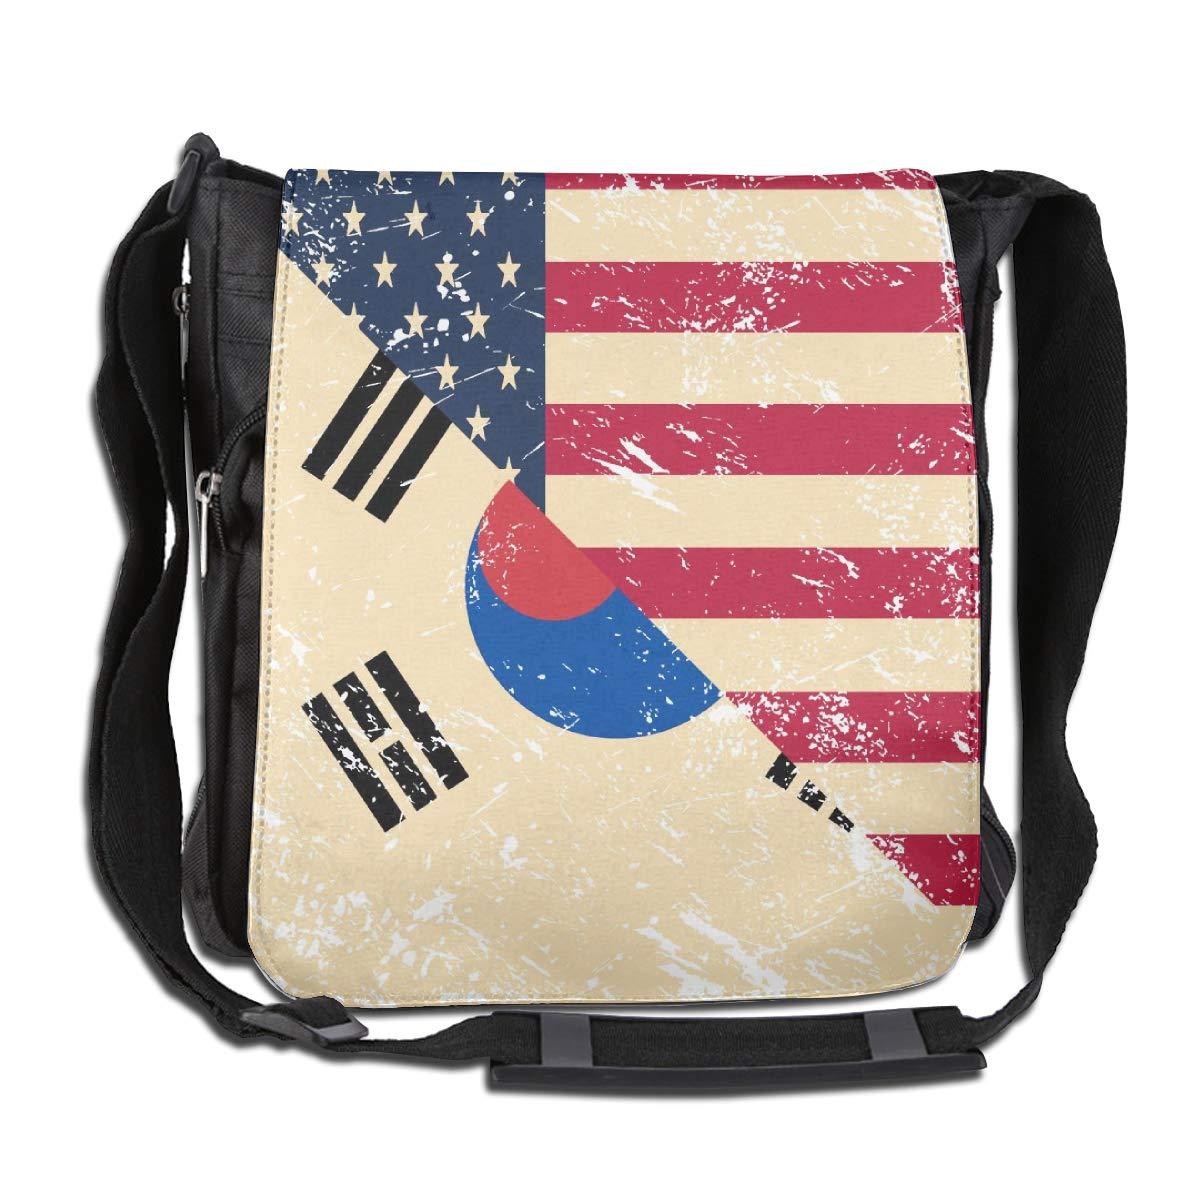 American And South Korea Retro Flag Crossbody Shoulder Bag Adjustable Casual Daily Messenger Bag Satchel School Bag For Women And Men